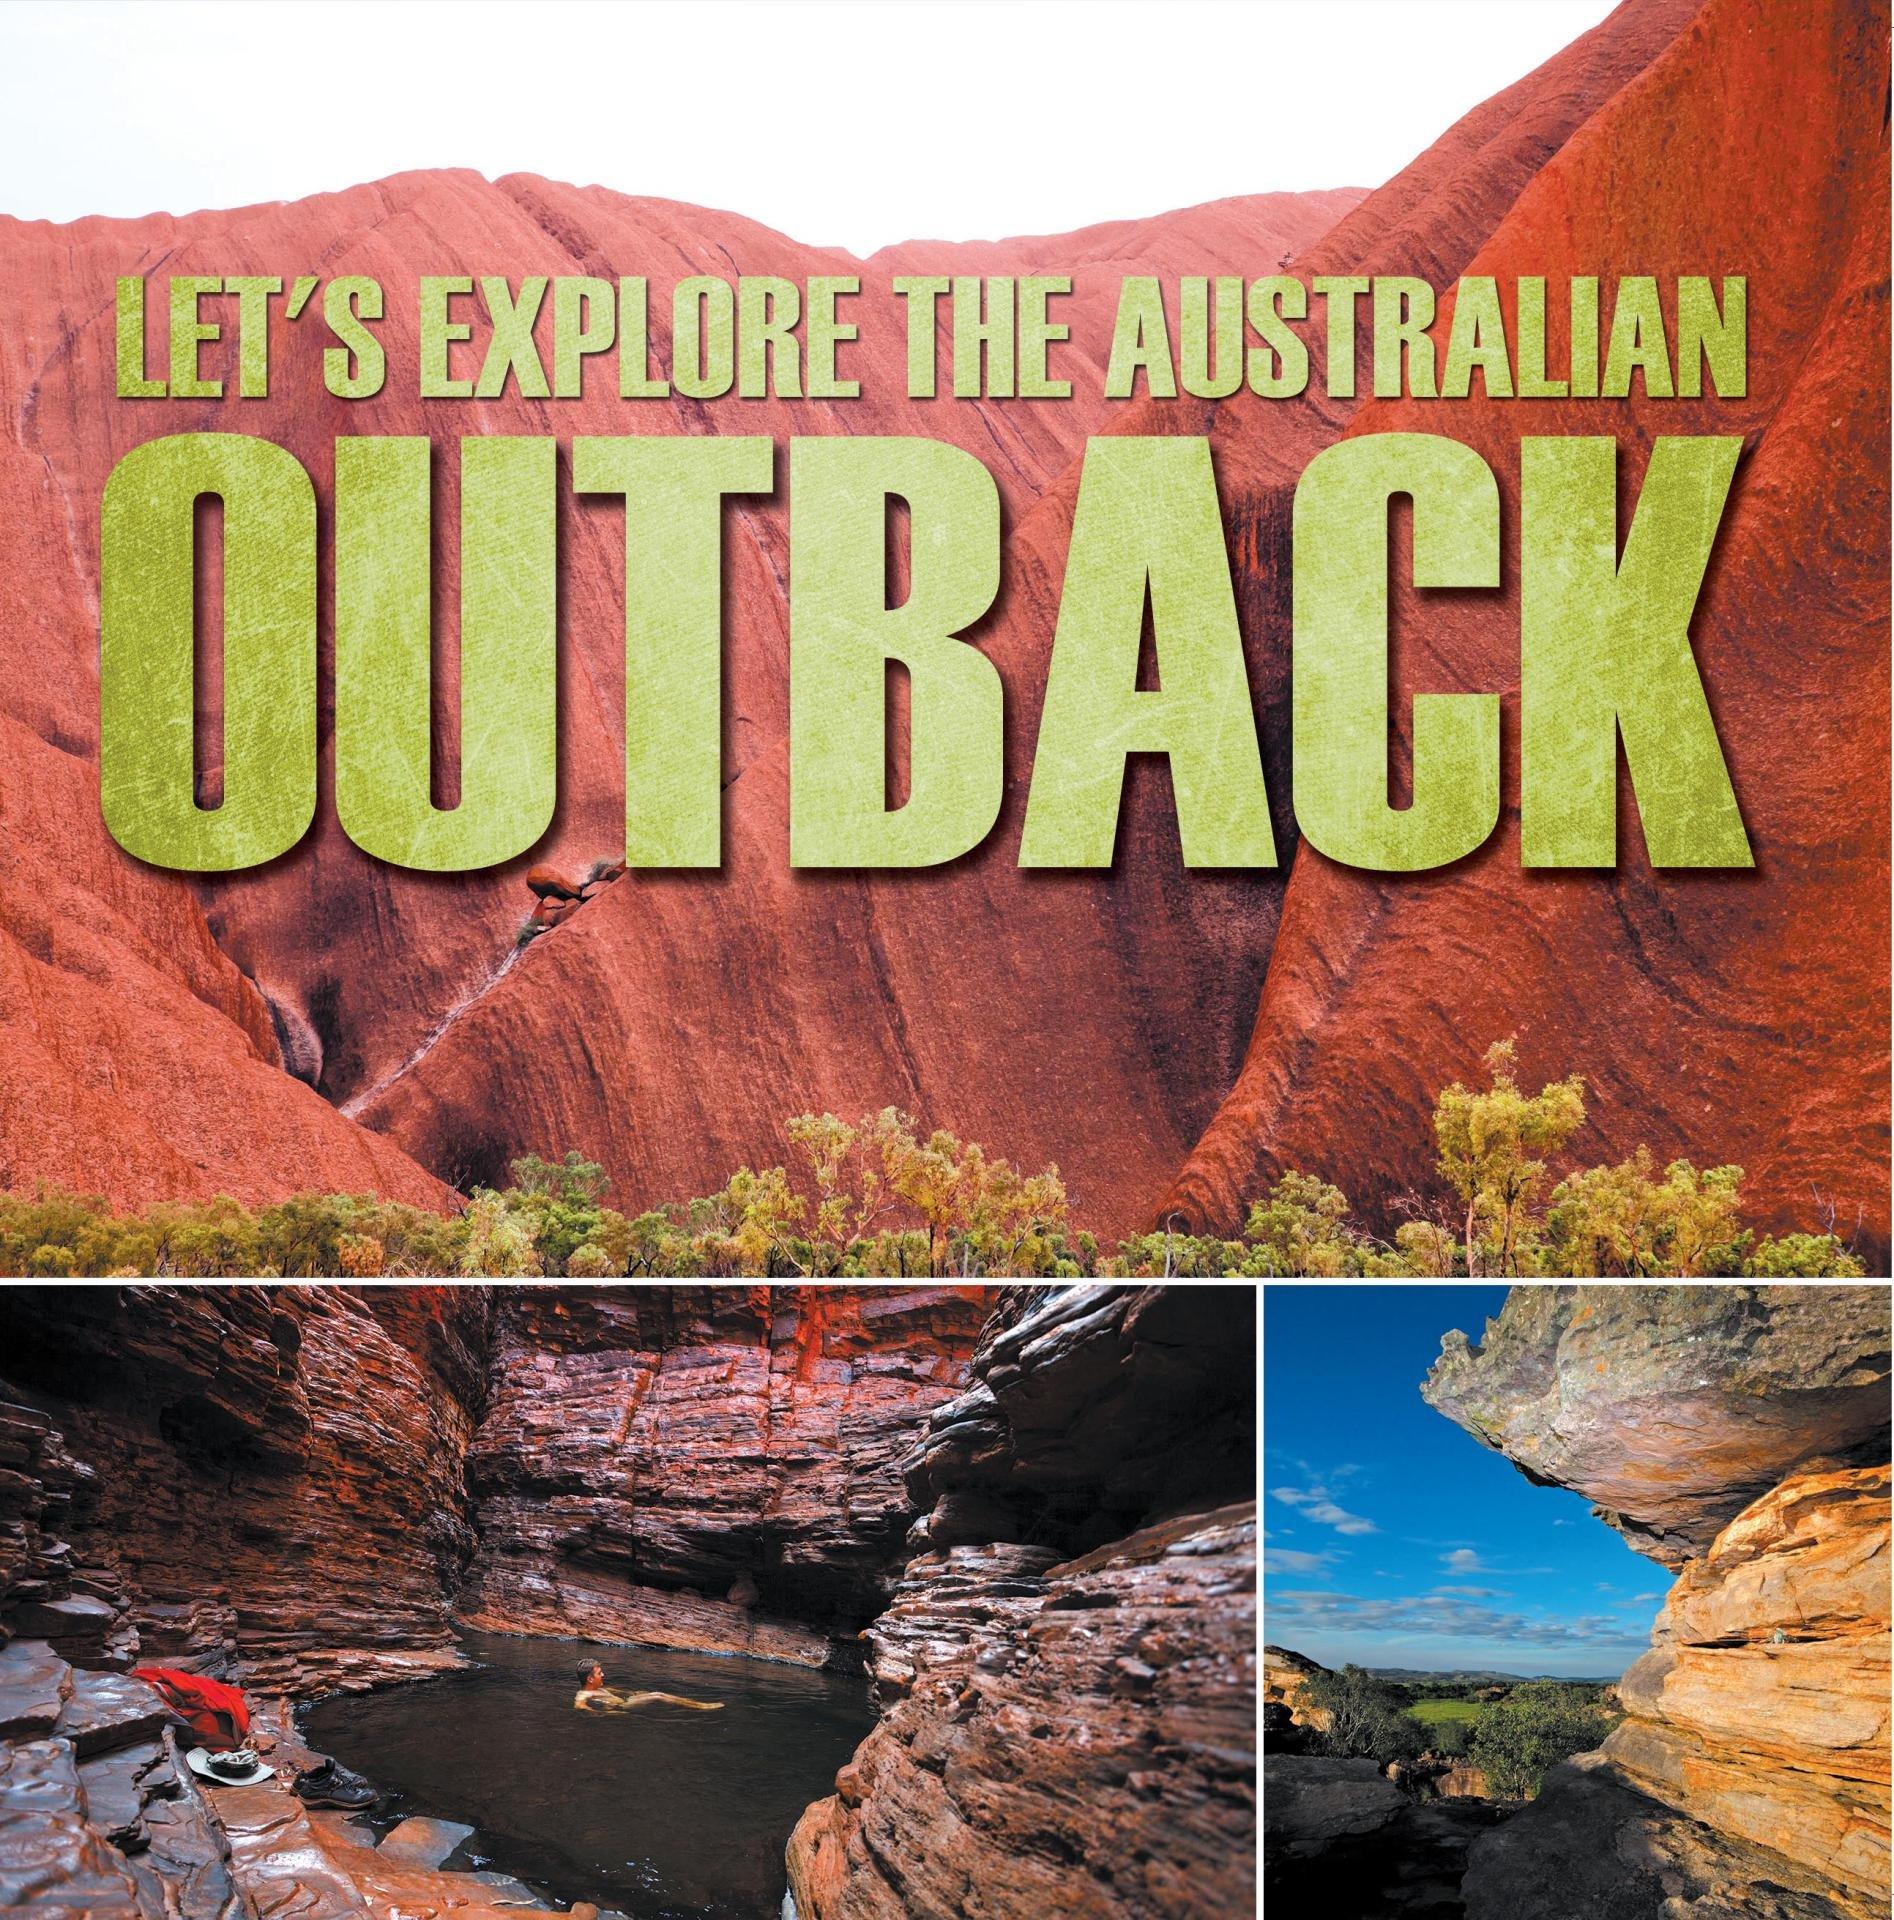 Let's Explore the Australian Outback: Australia Travel Guide for Kids (Children's Explore the World Books) (English Edition)